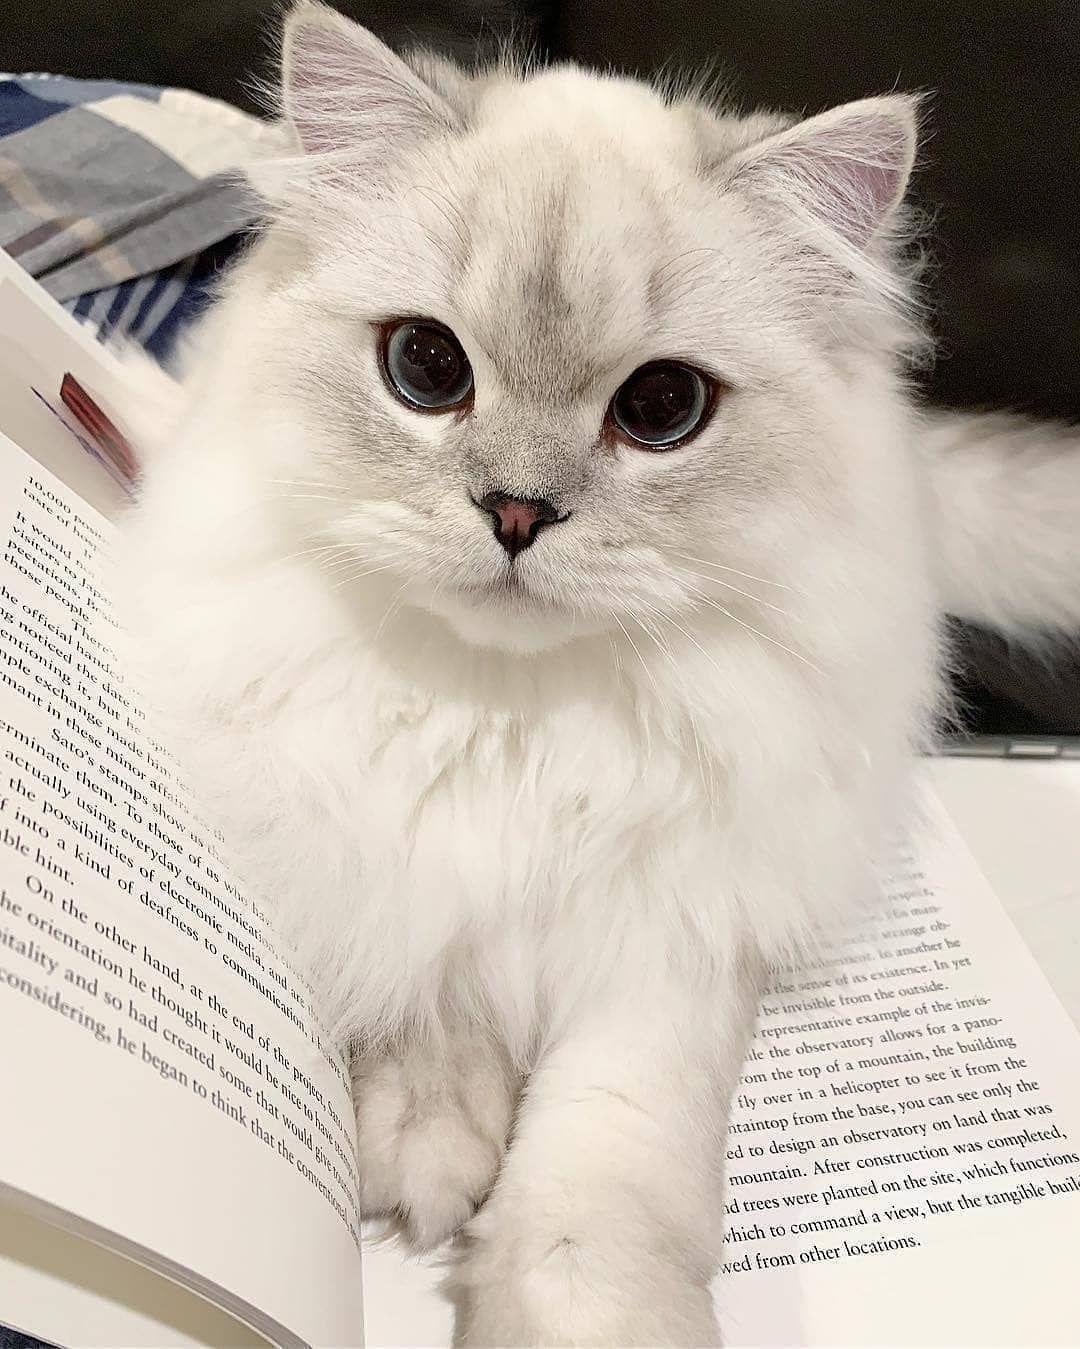 Https Www Facebook Com Catstage2016 Photos A 970303312988831 2420132111339270 Type 3 Theater Kittens Near Me Kittens Cutest Cute Cats